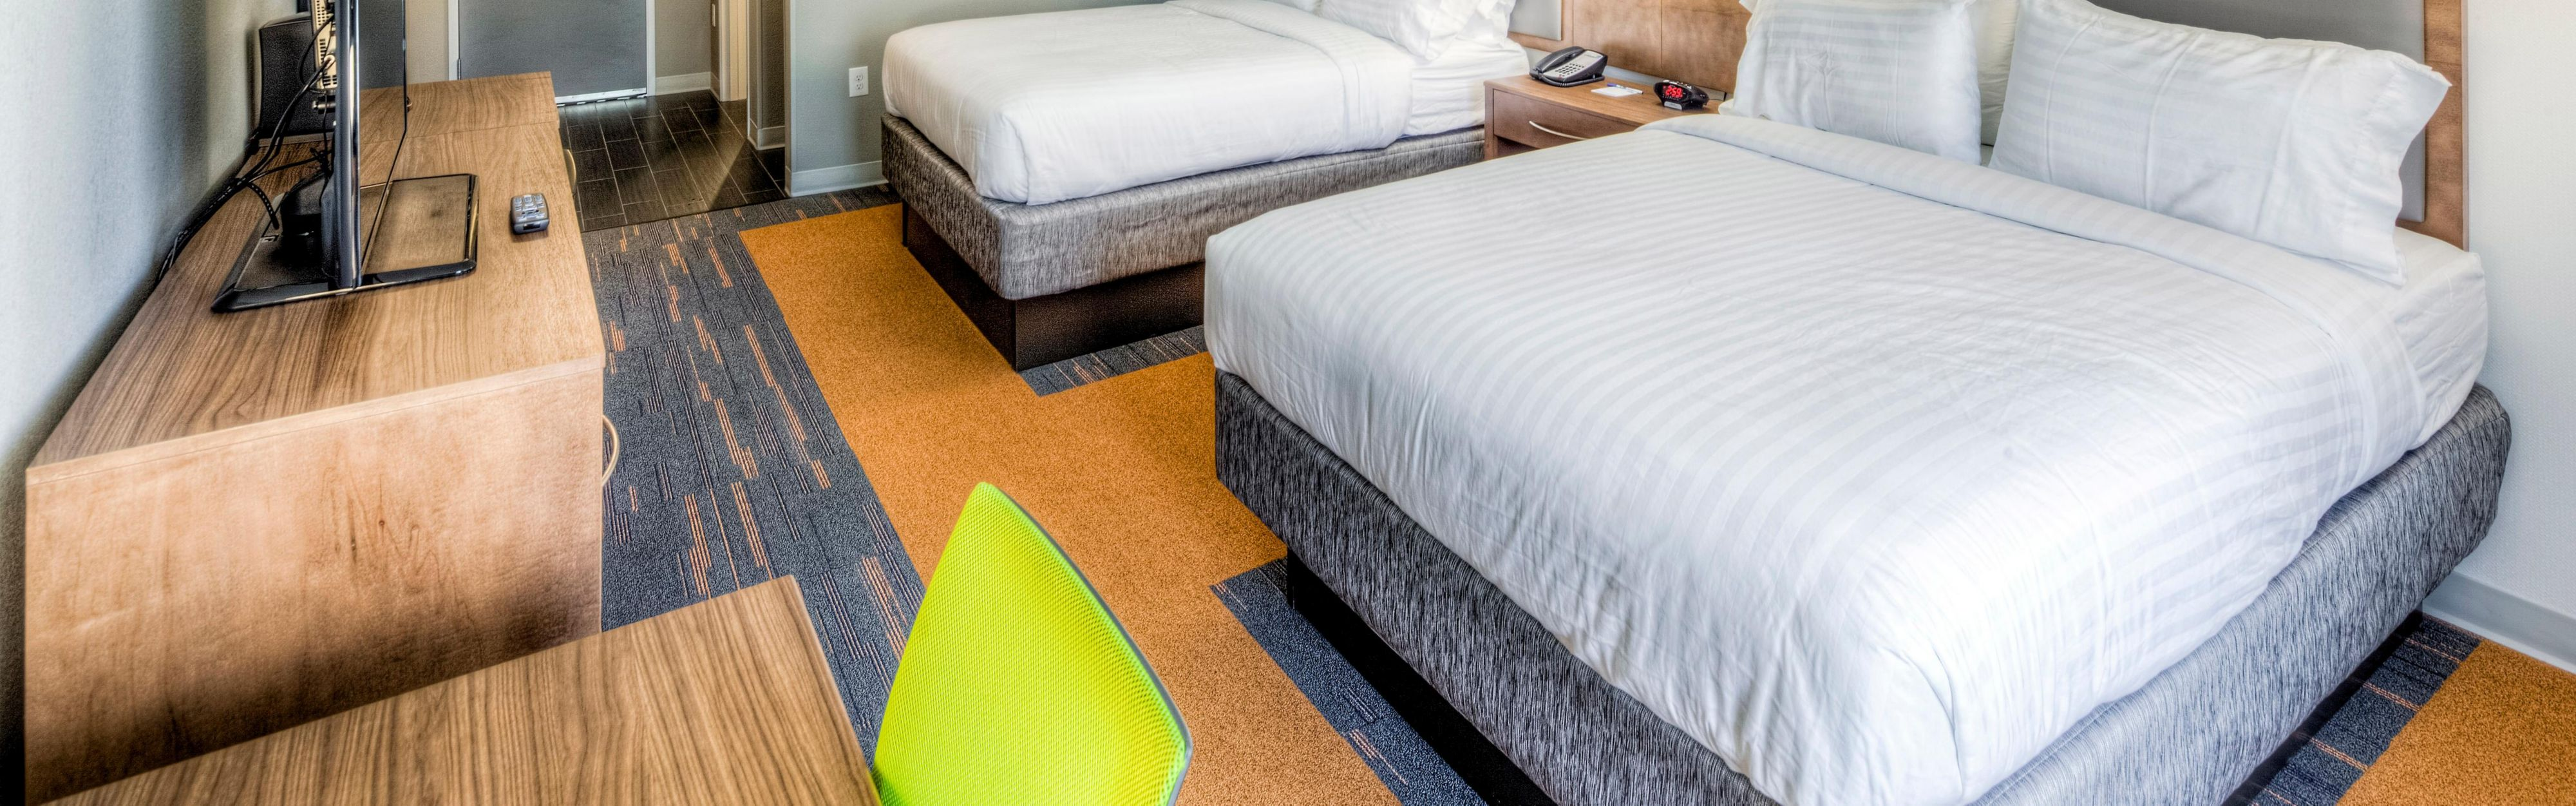 Holiday Inn Express & Suites Cleveland West - Westlake image 1